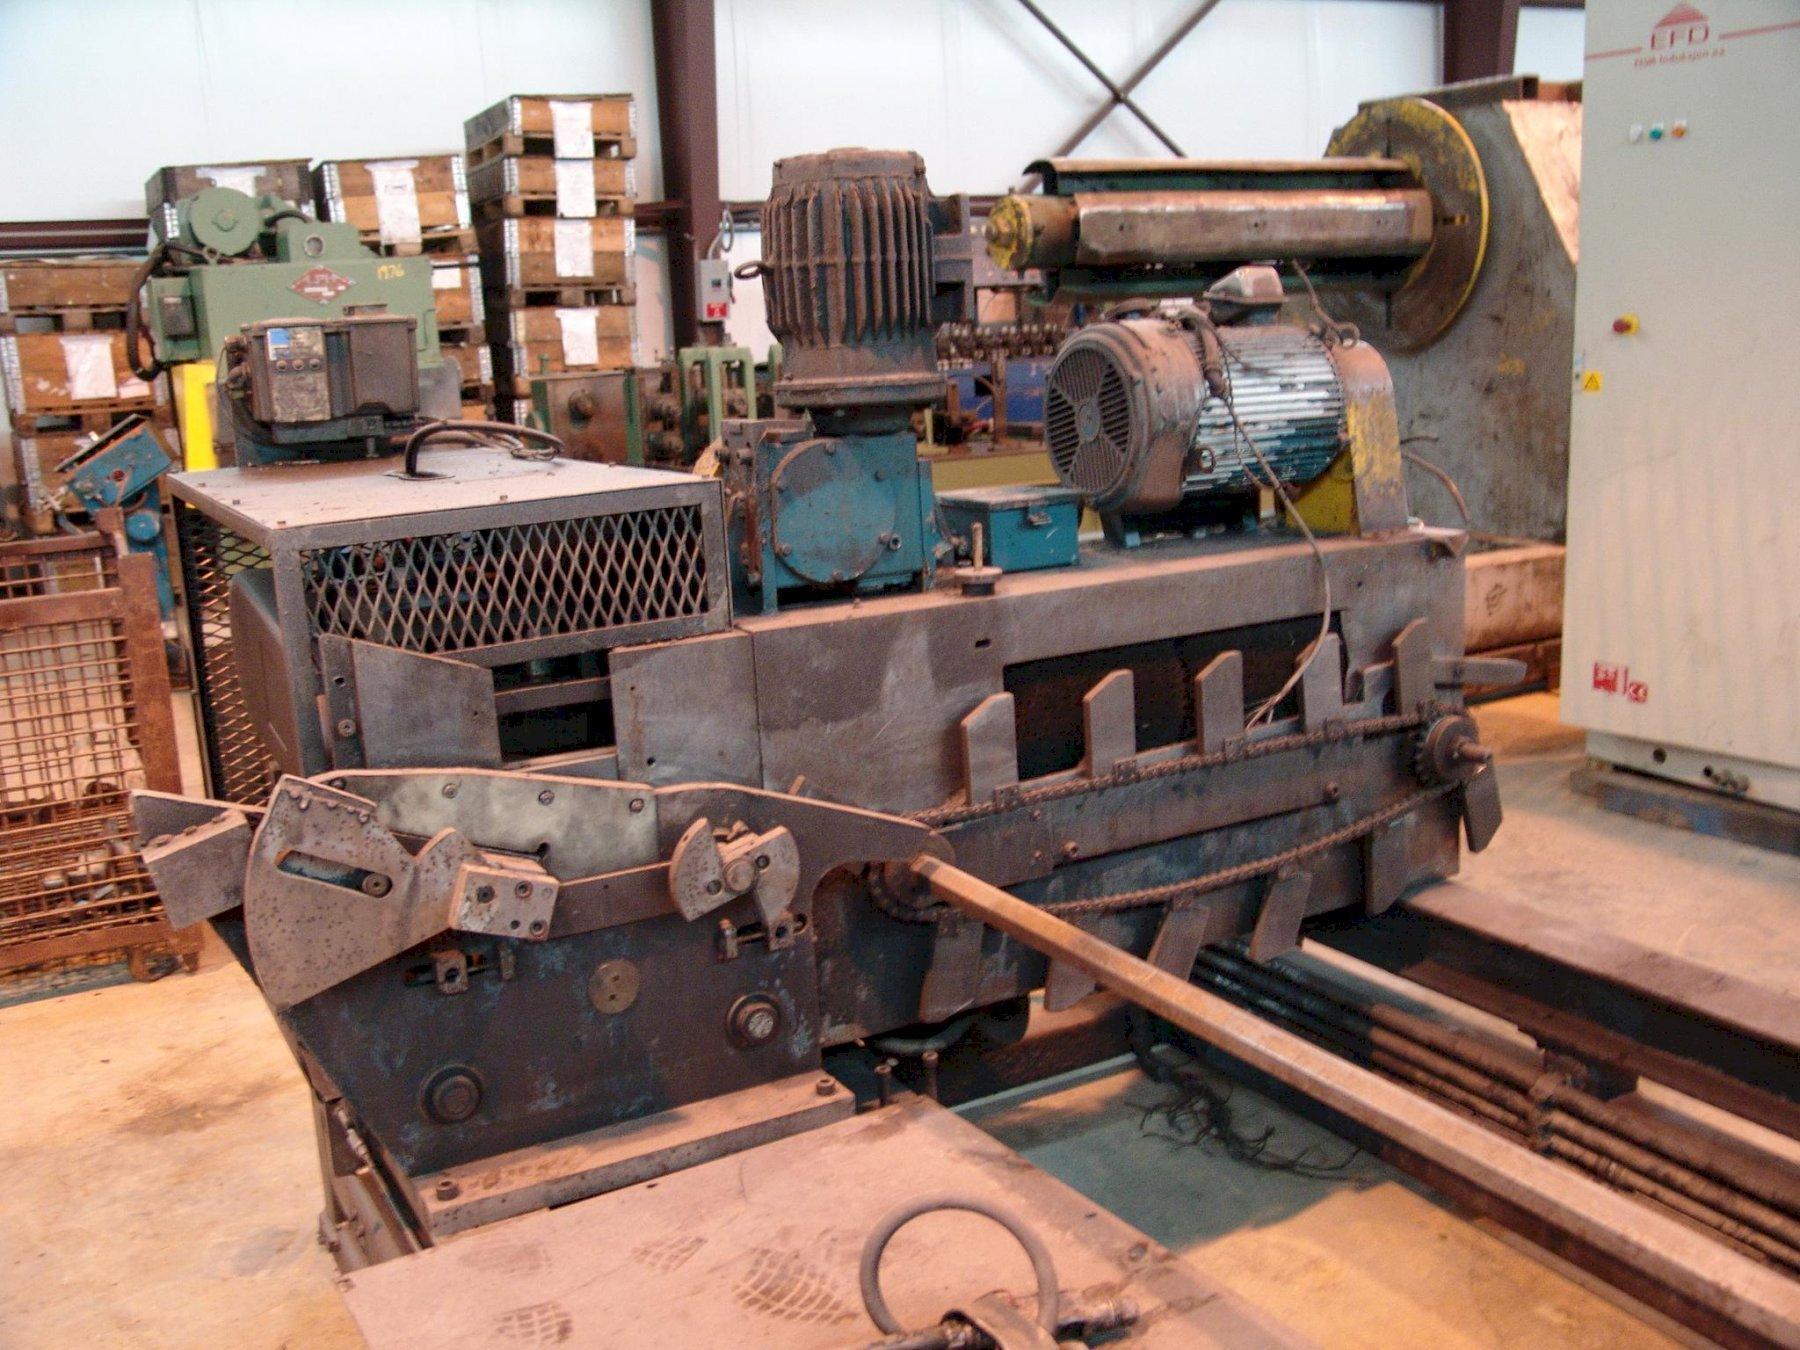 Buckeye #191-97020 Dedimpler & Deburring Machine